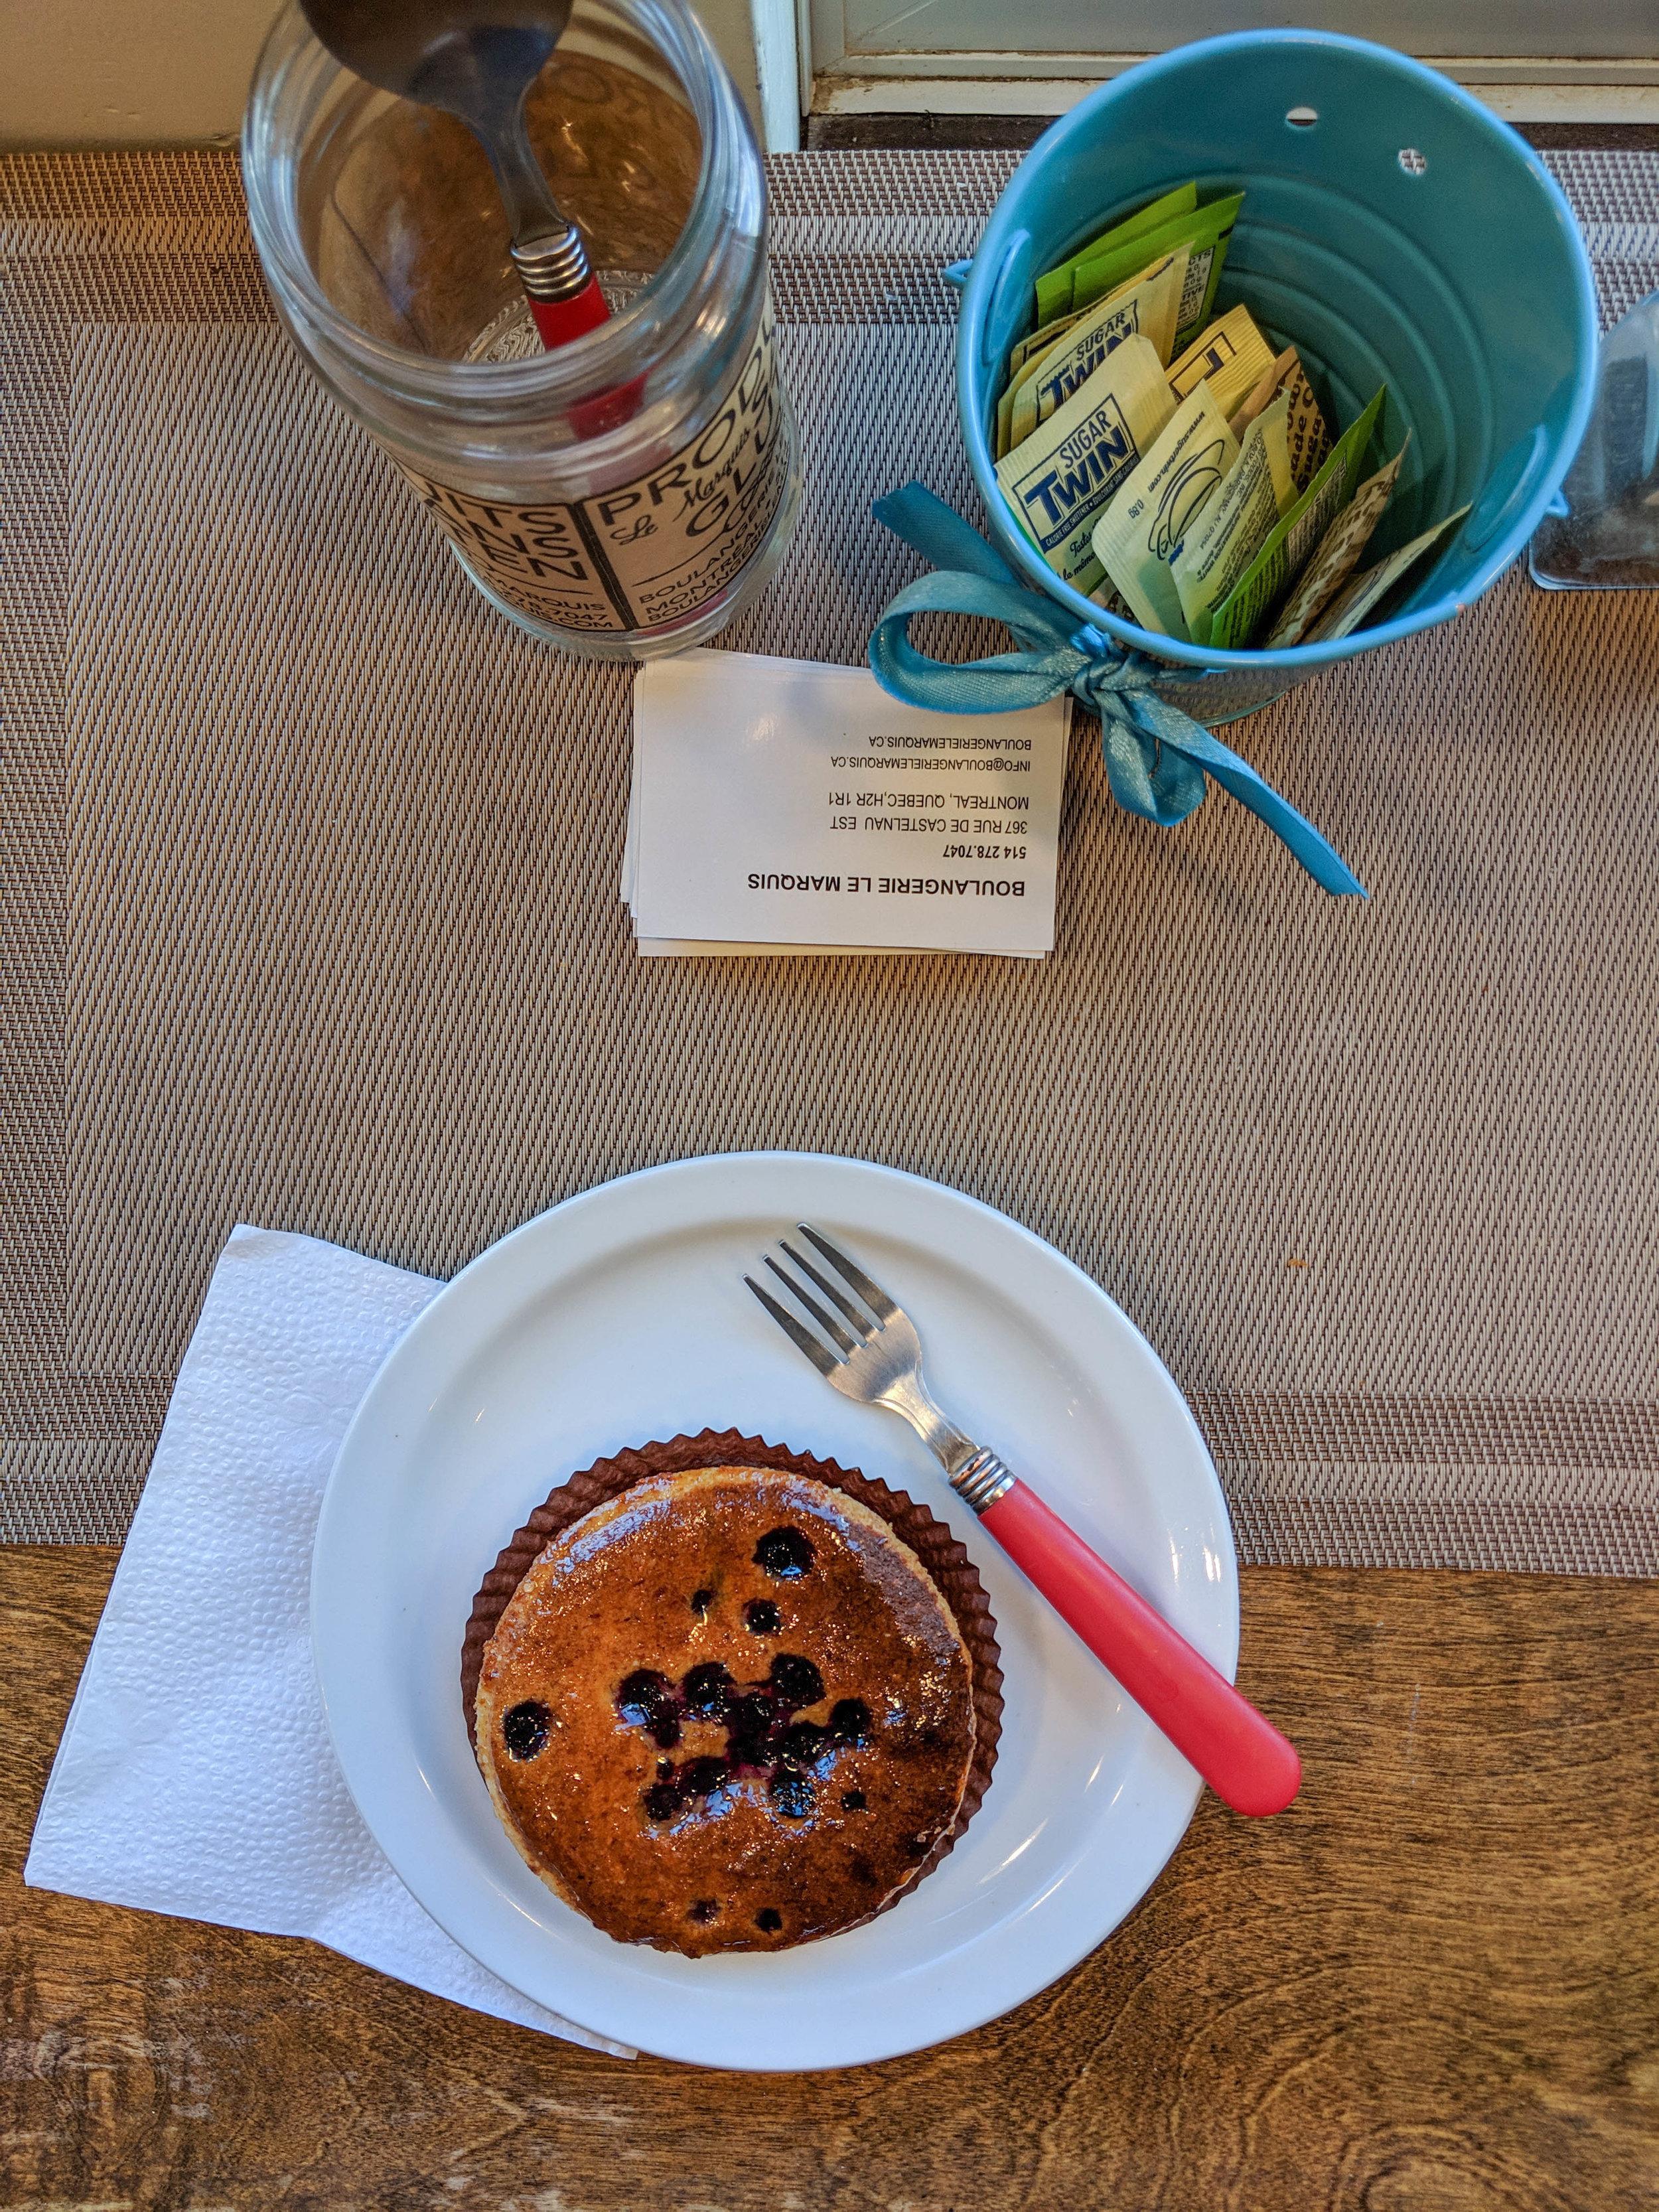 bri rinehart; montreal; le marquis sans gluten; foodie